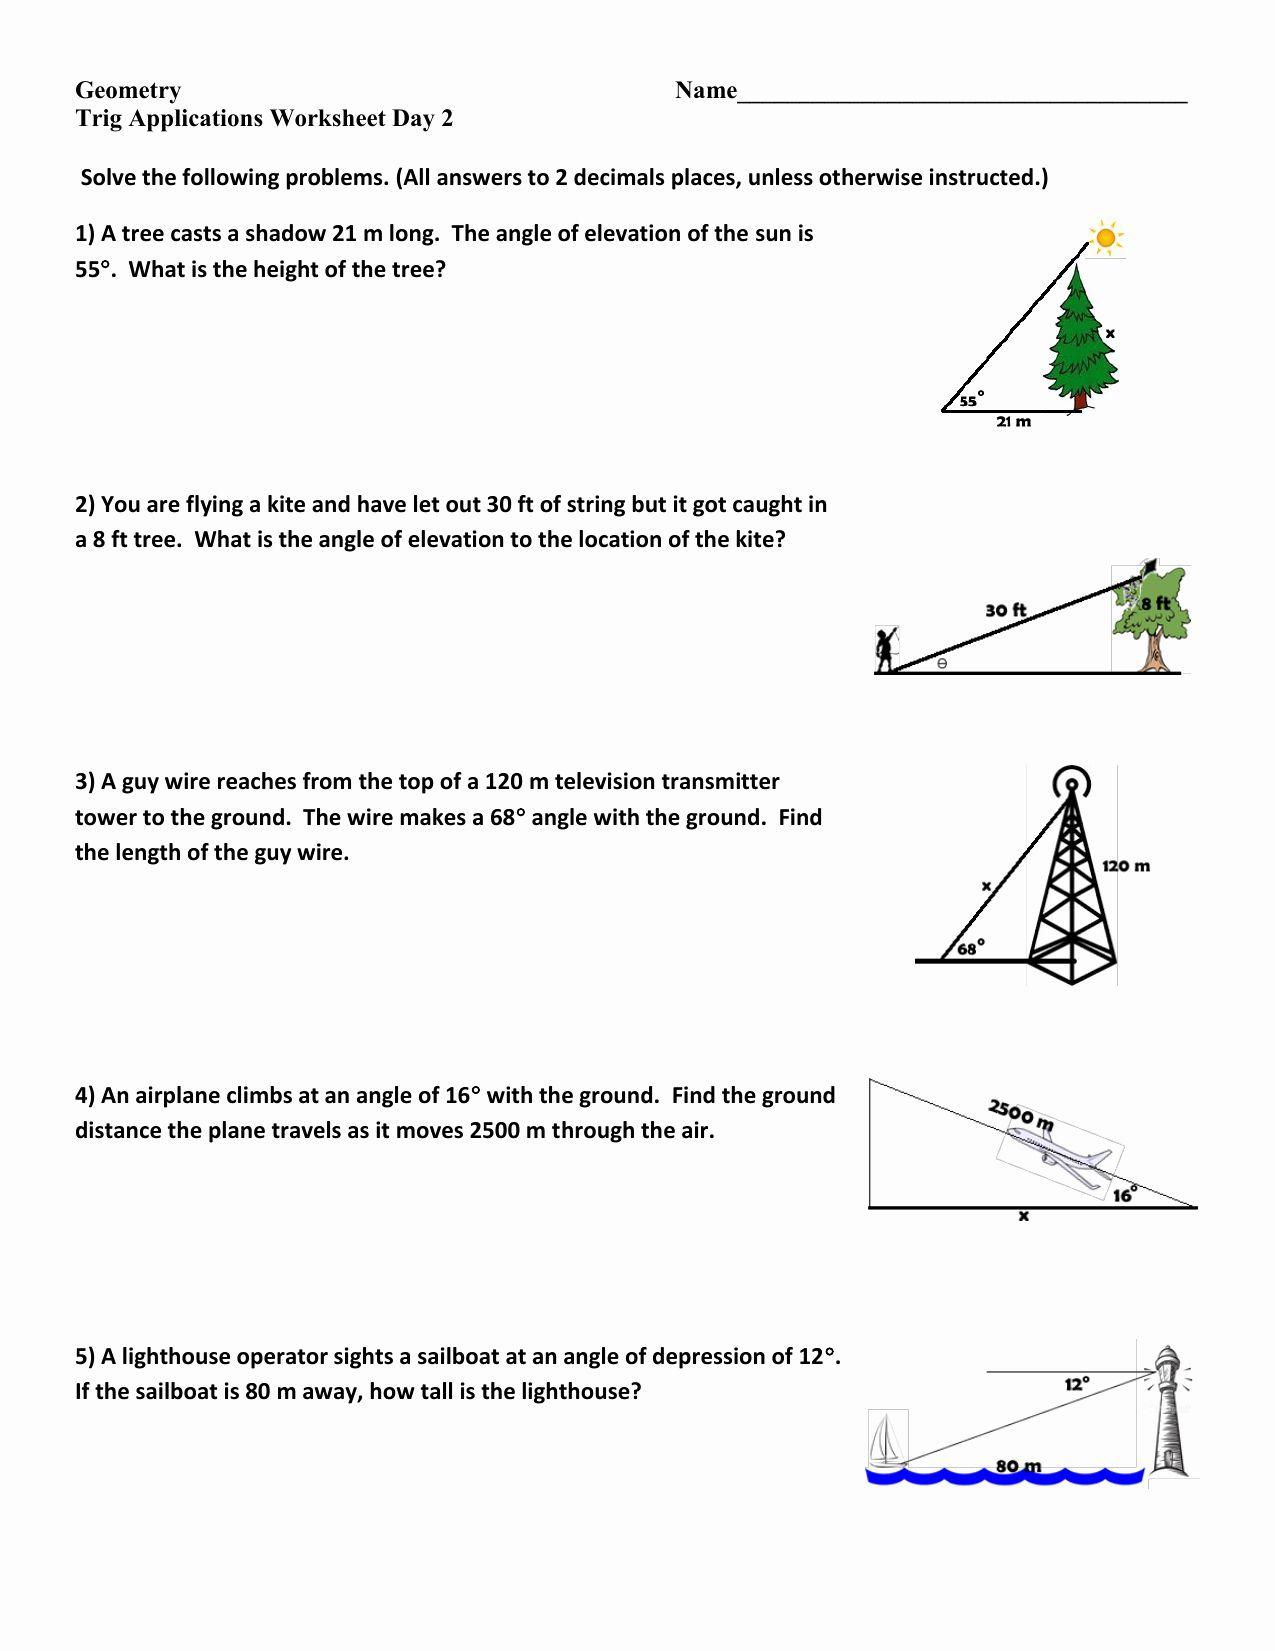 medium resolution of Right Triangle Trigonometry Worksheet Luxury Trigonometry Word Problems  Worksheets with Answers   Trigonometry worksheets